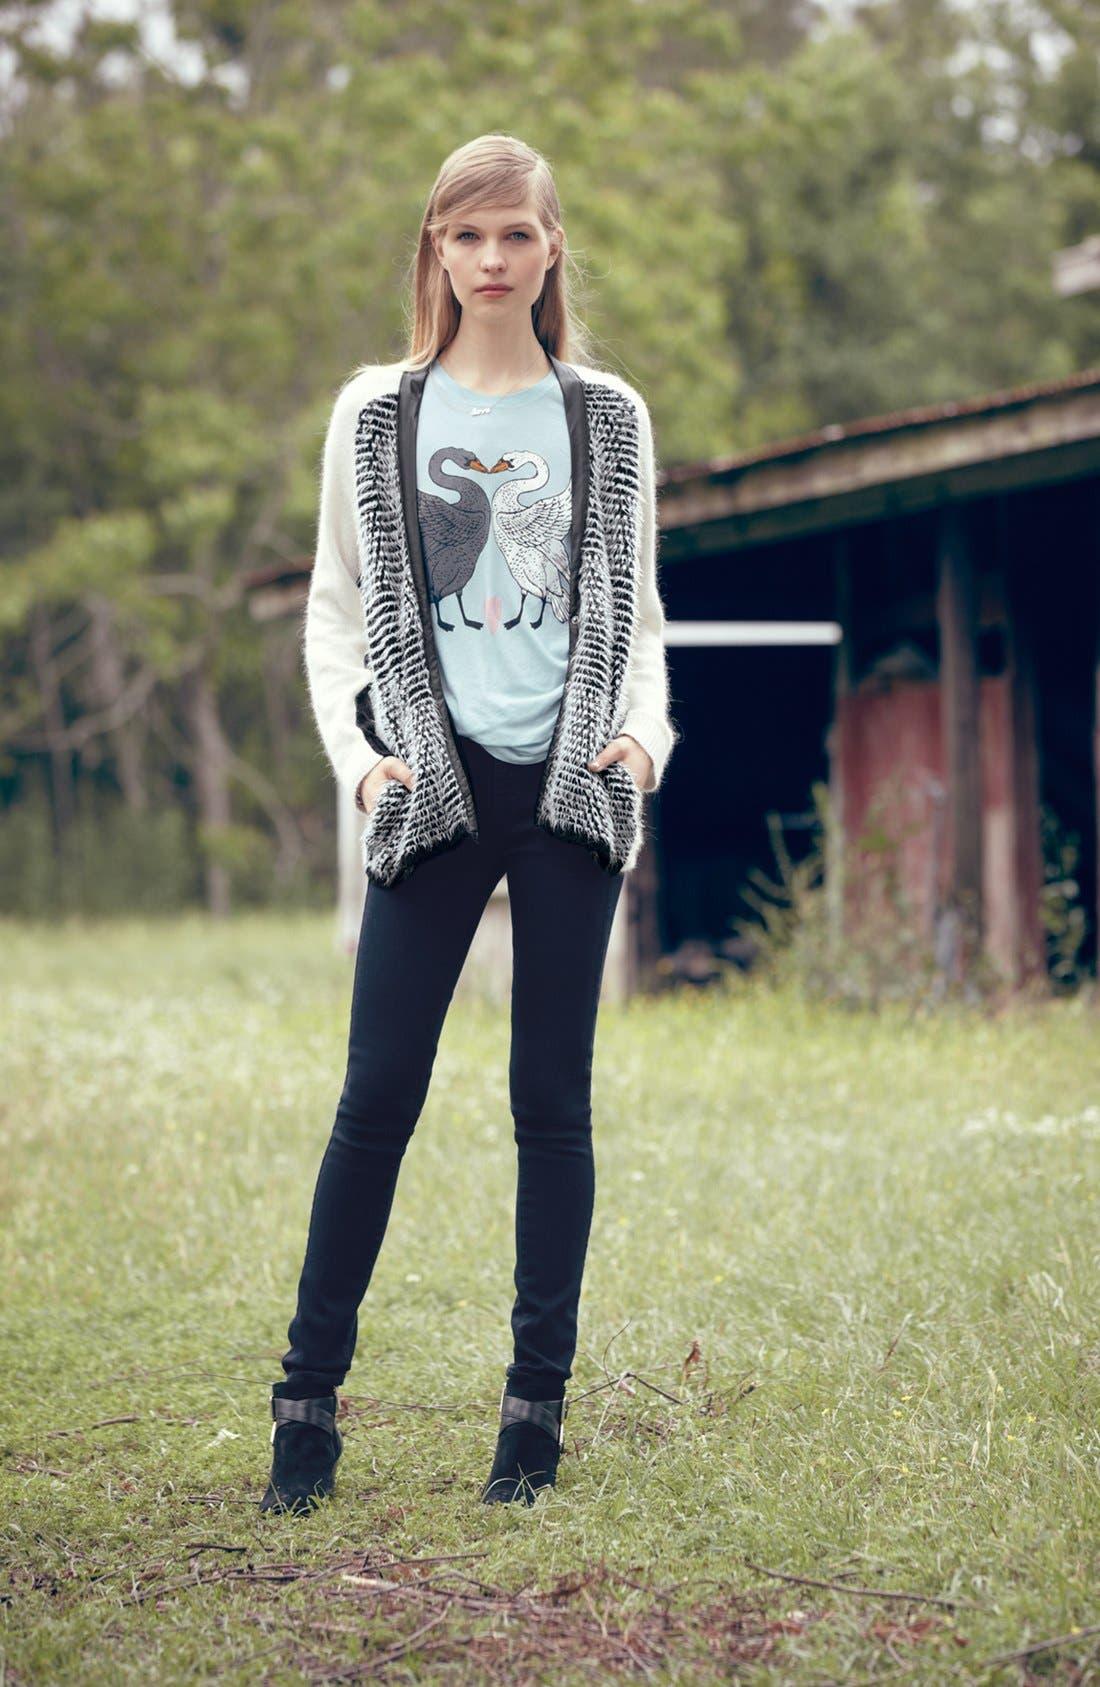 Alternate Image 1 Selected - Trouvé Cardigan, Wildfox Tee & Paige Denim Jeans